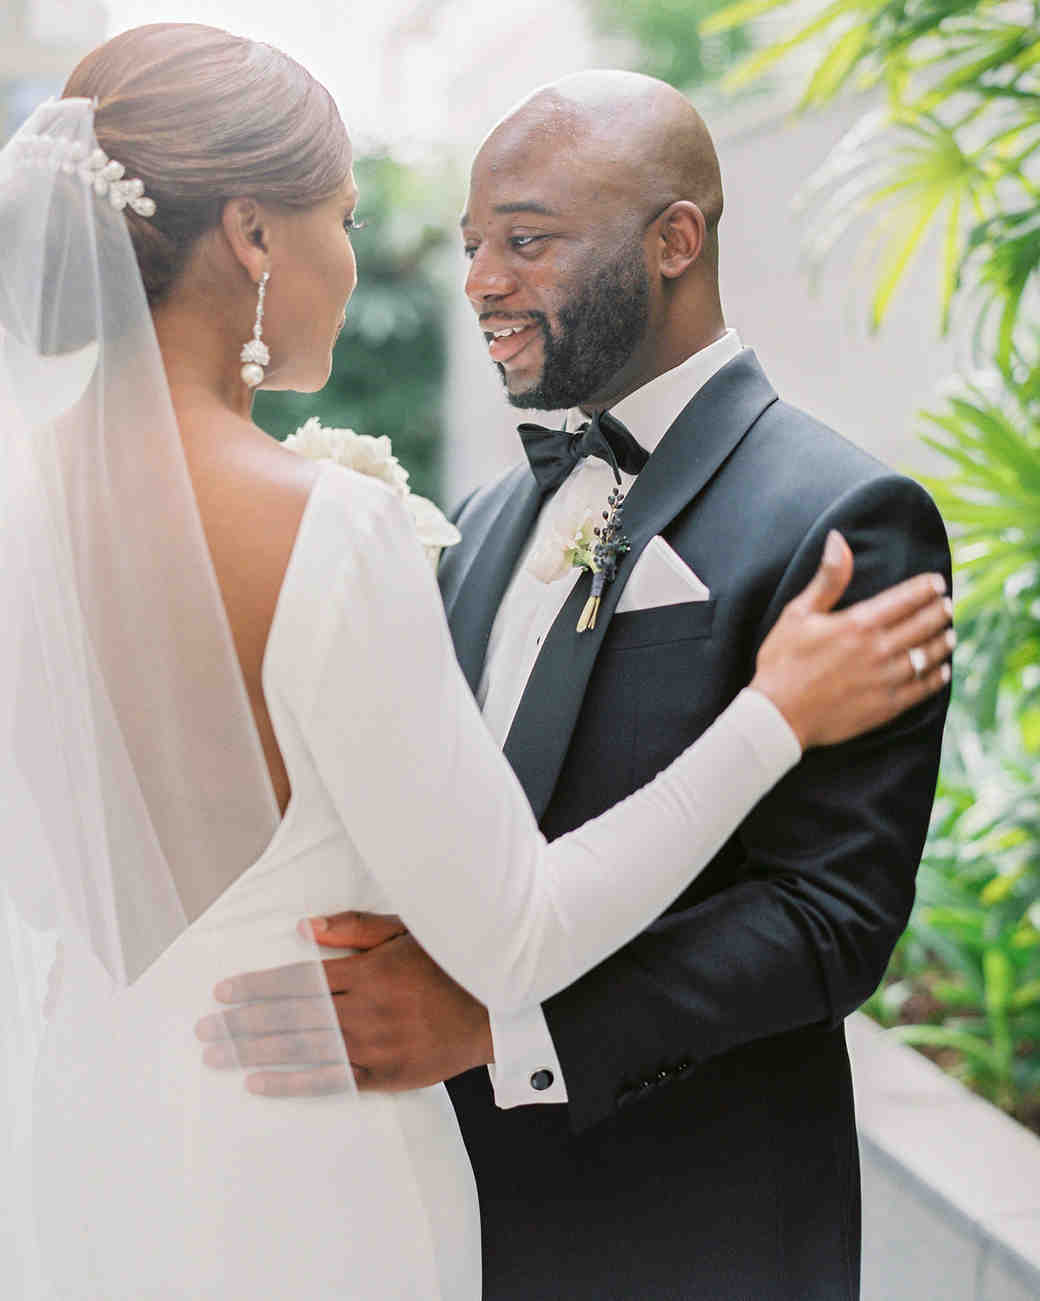 vanessa abidemi wedding first look